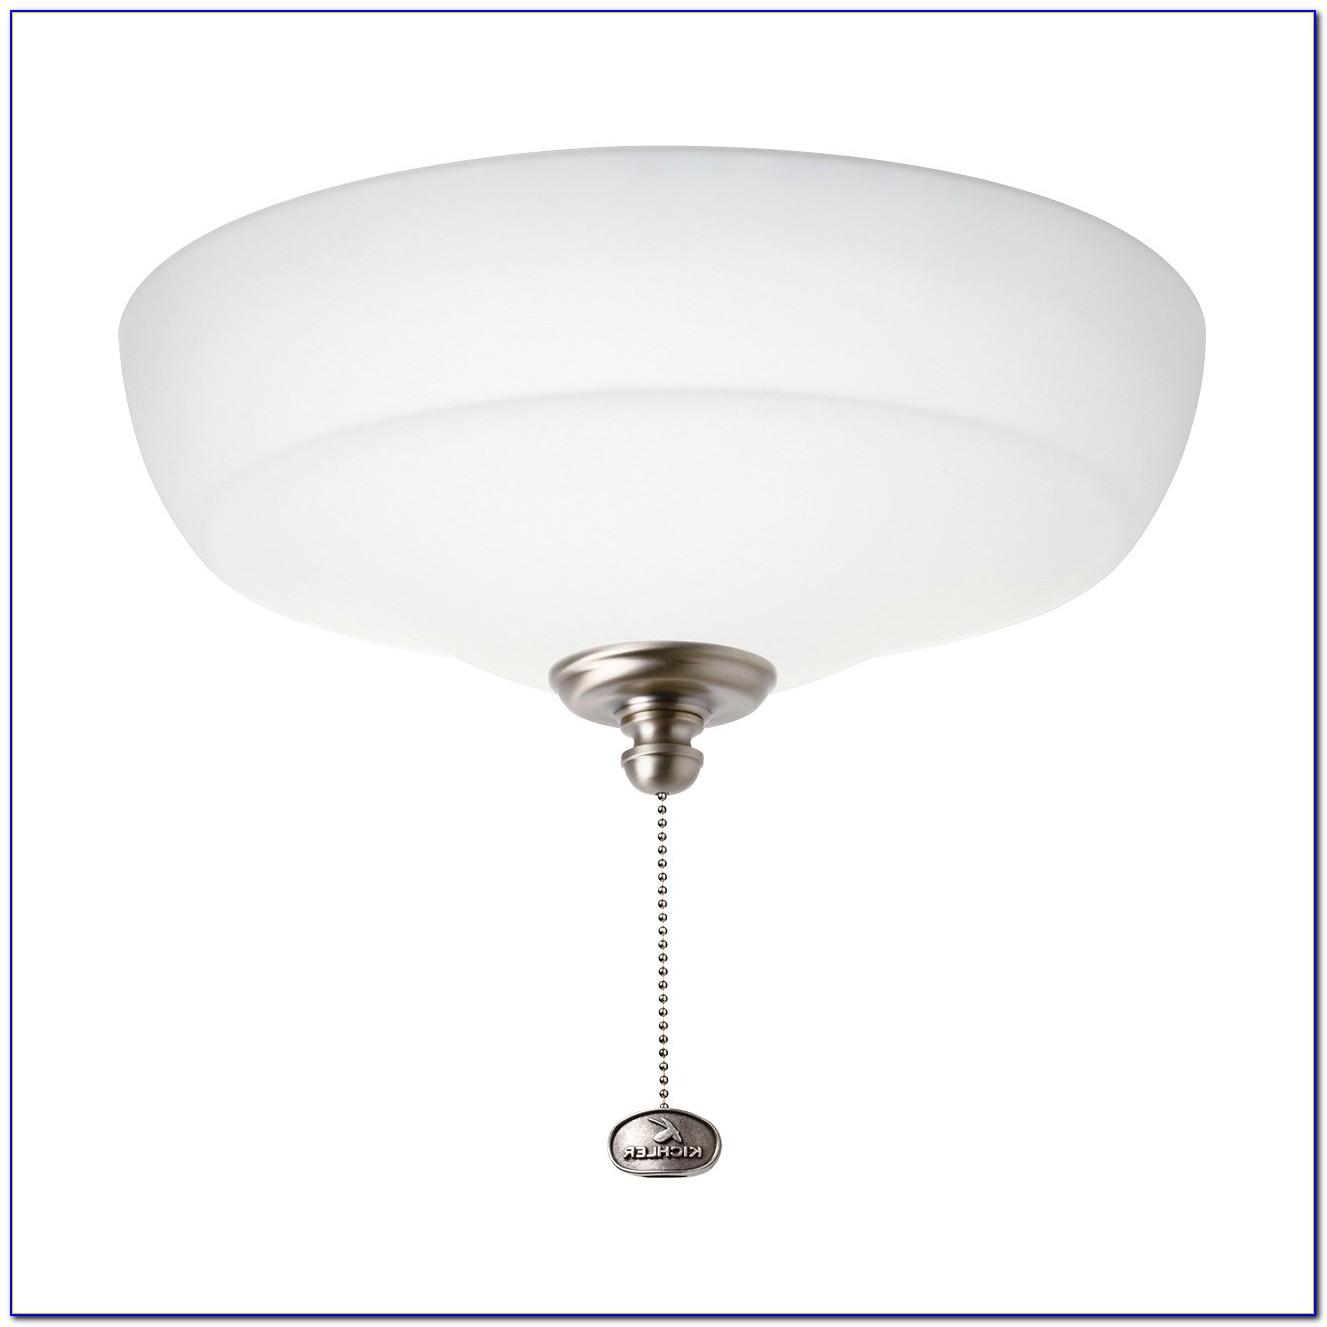 Universal Ceiling Fan Light Kit Oil Rubbed Bronze